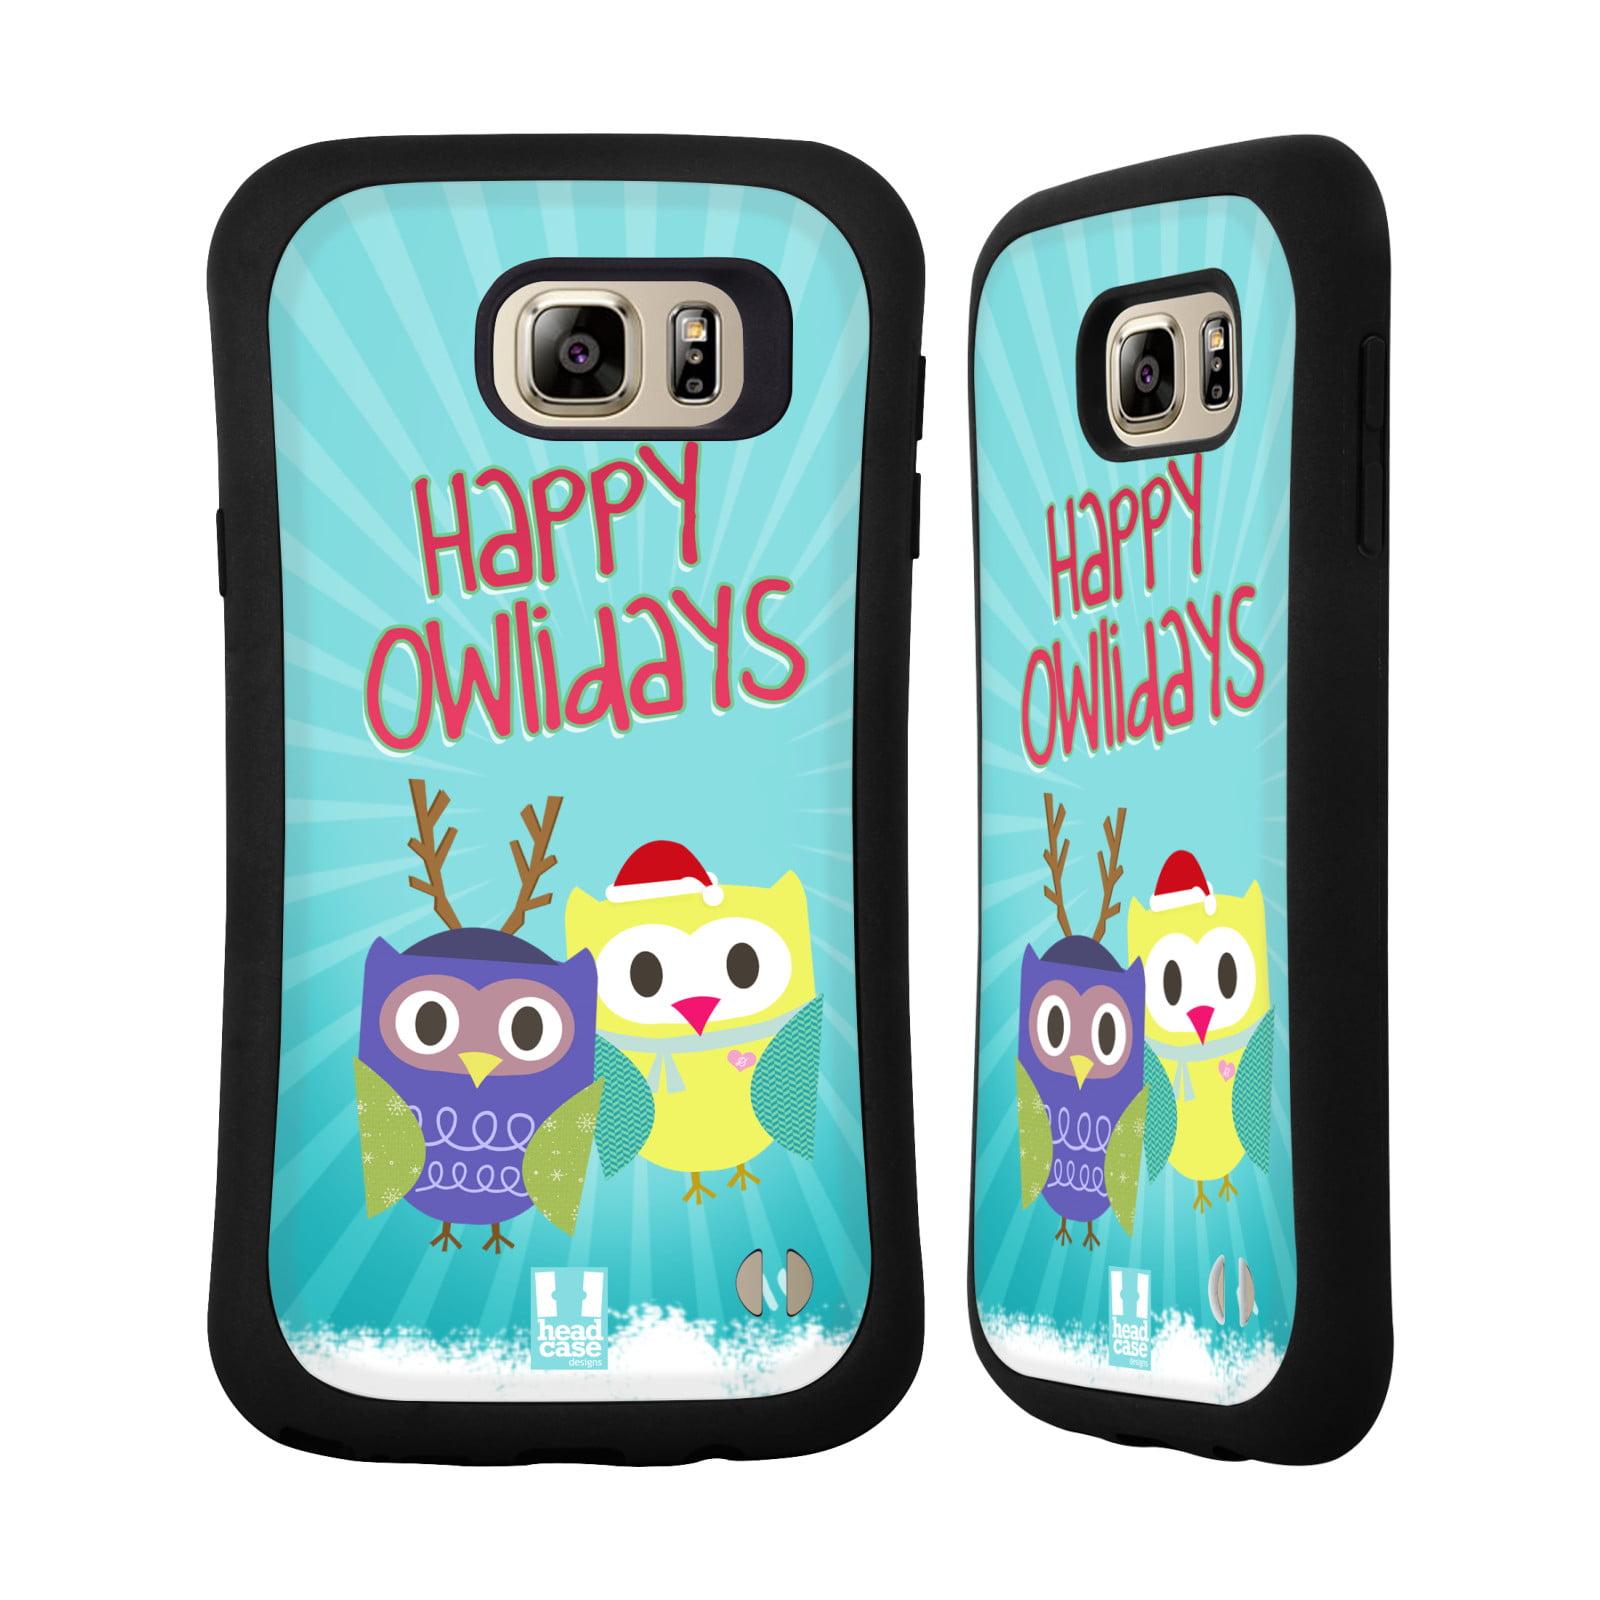 HEAD CASE DESIGNS OWL XMAS HYBRID CASE FOR SAMSUNG PHONES